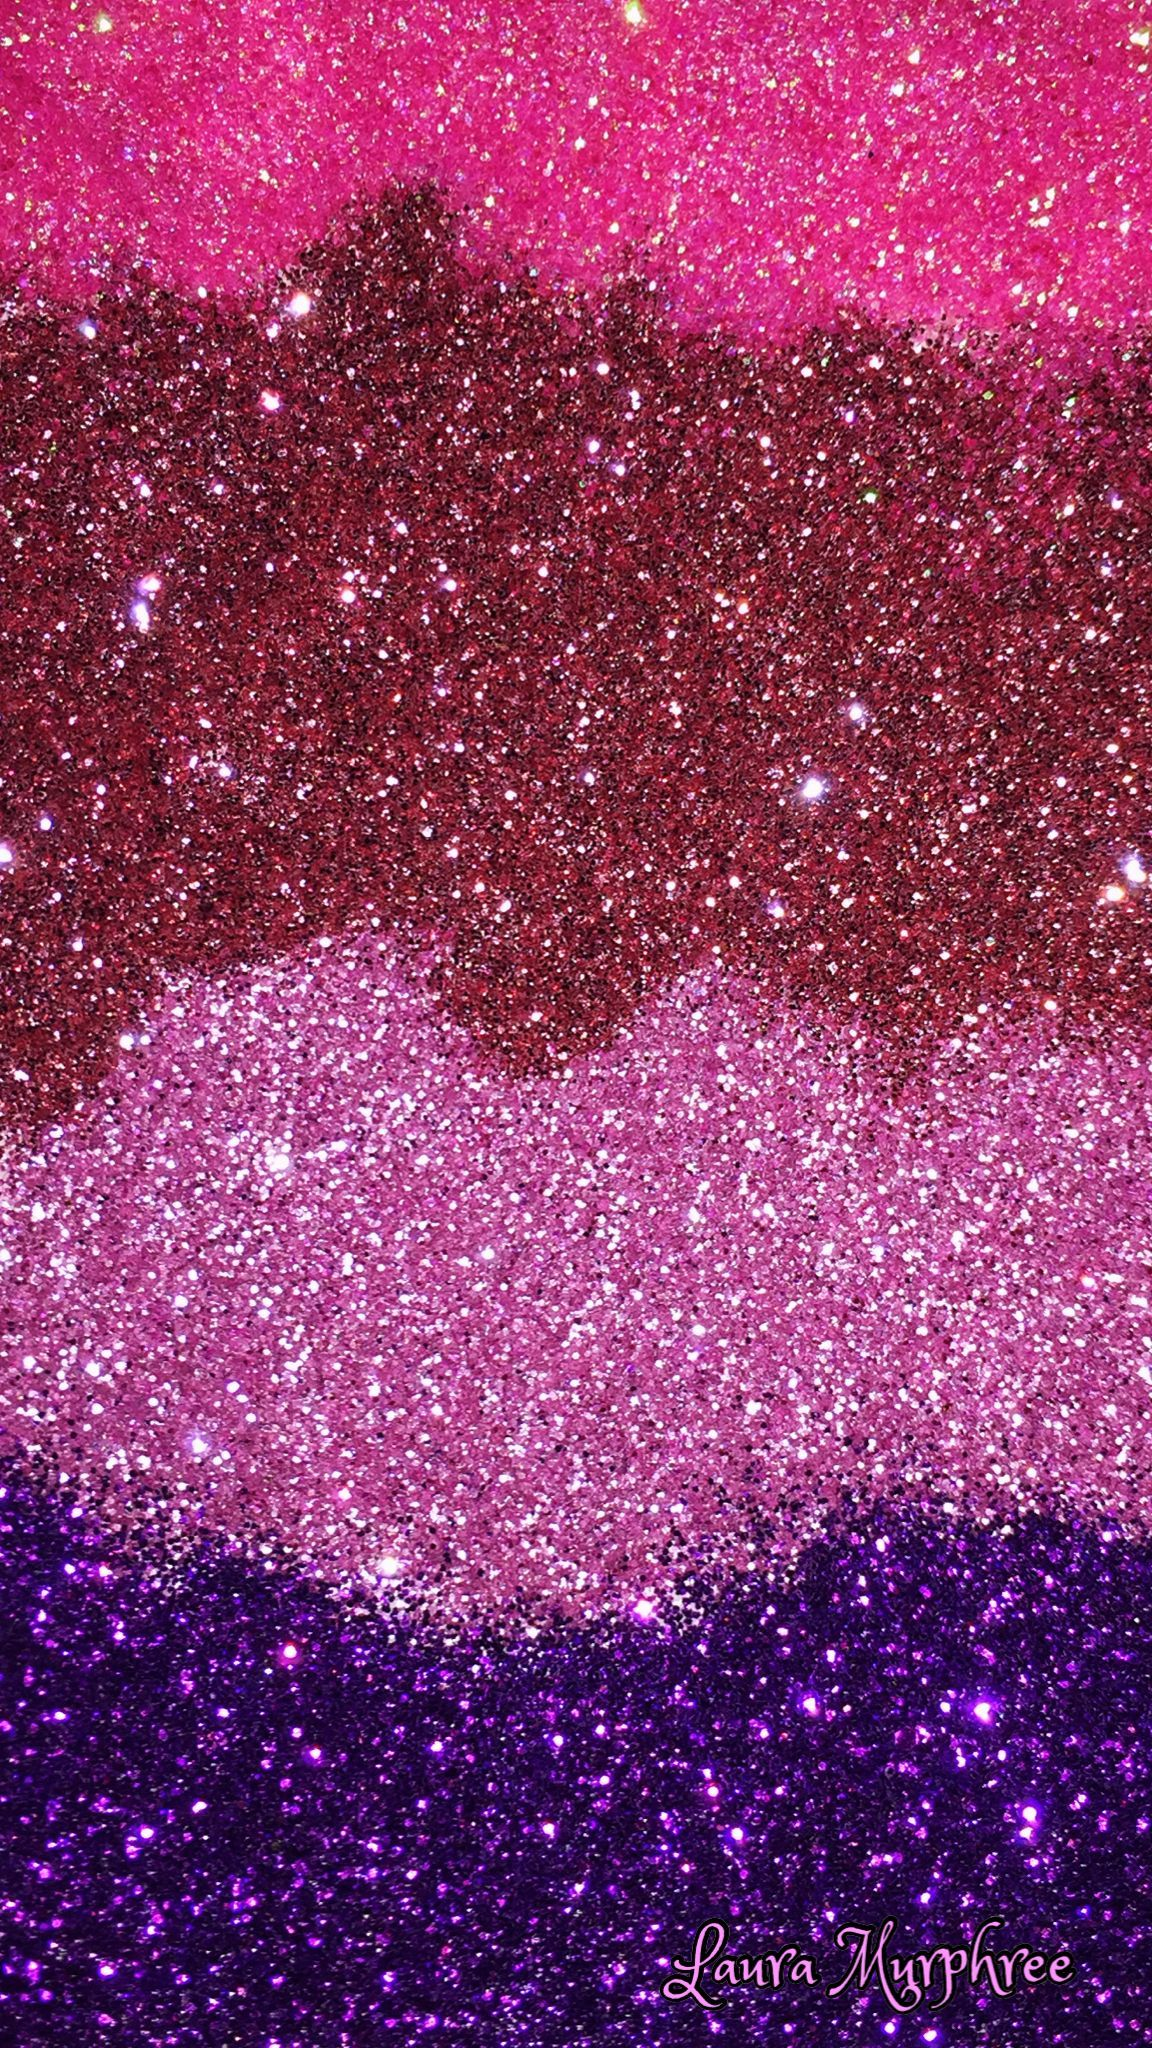 Glitter phone wallpaper colorful sparkle background pretty girly glitter phone wallpaper colorful sparkle background pretty girly sparkling pink purple glitter glitterfondos voltagebd Image collections